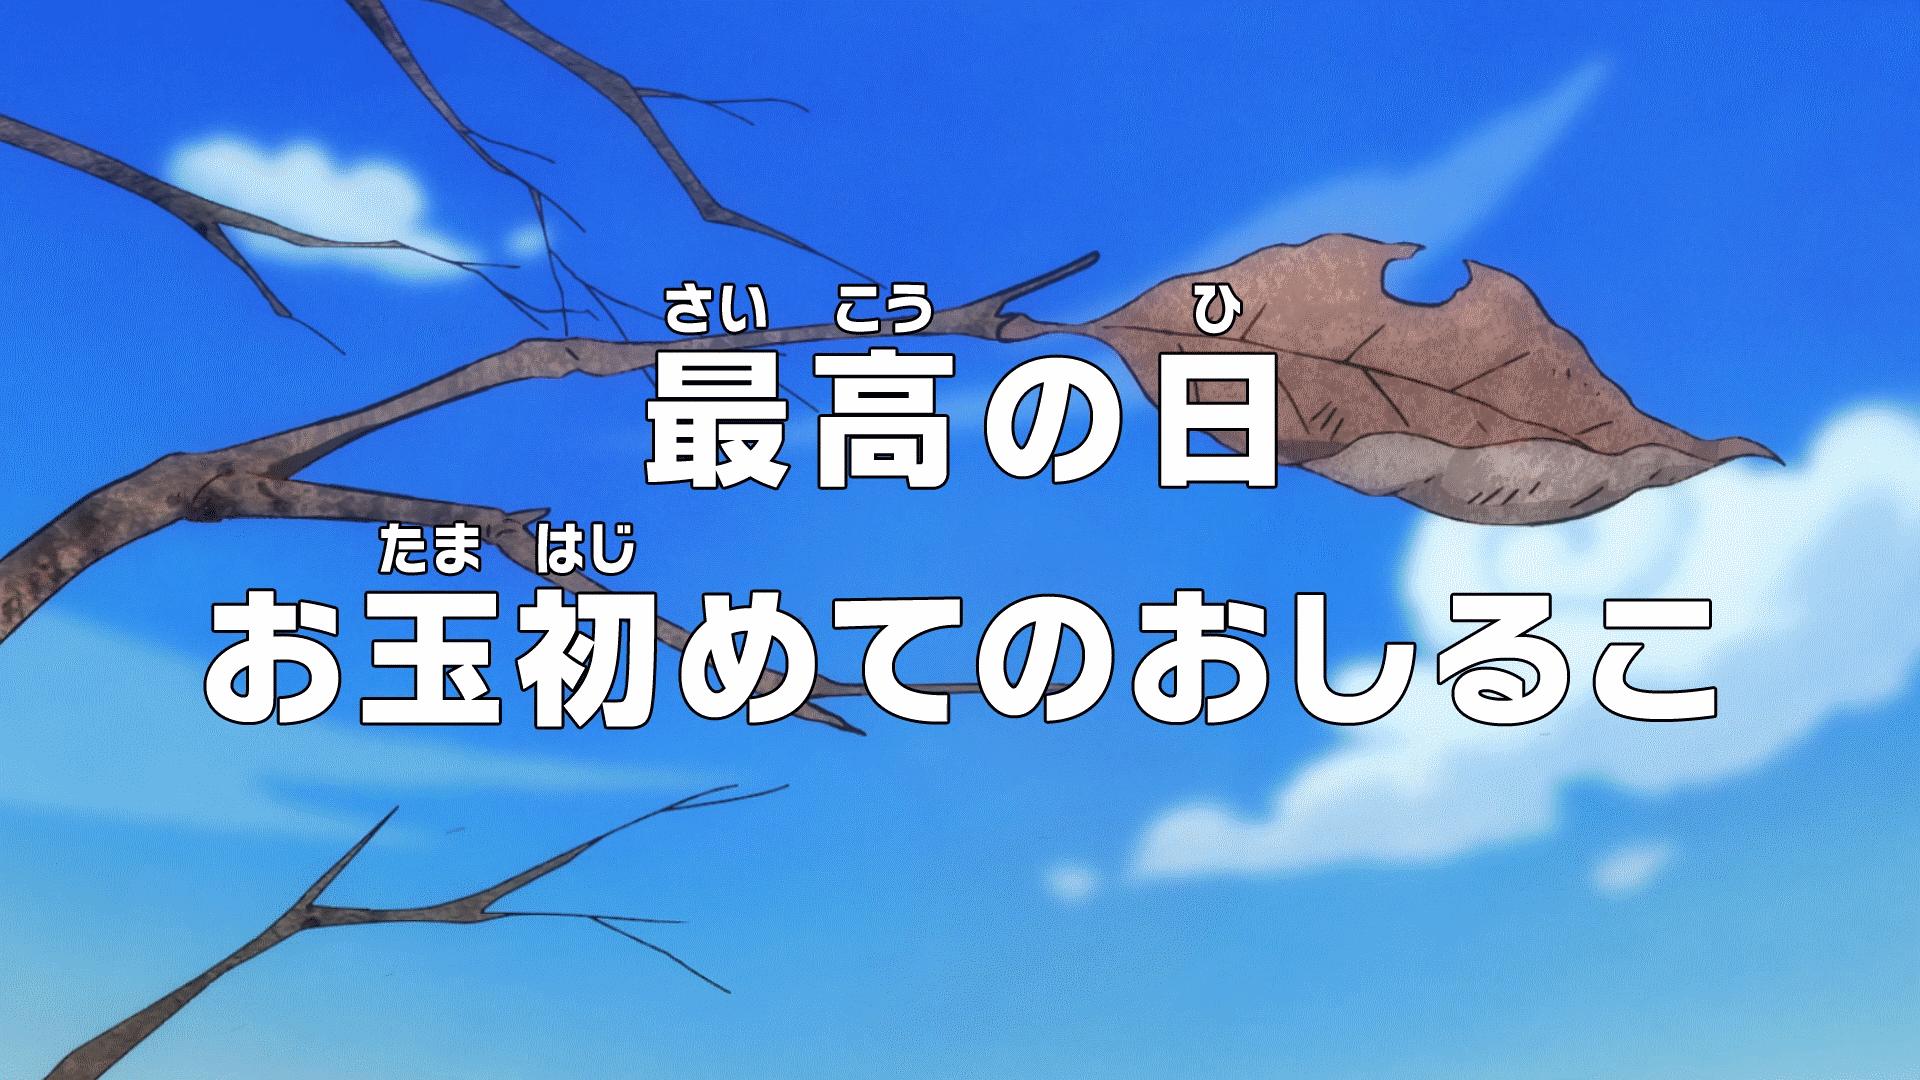 Episode 900